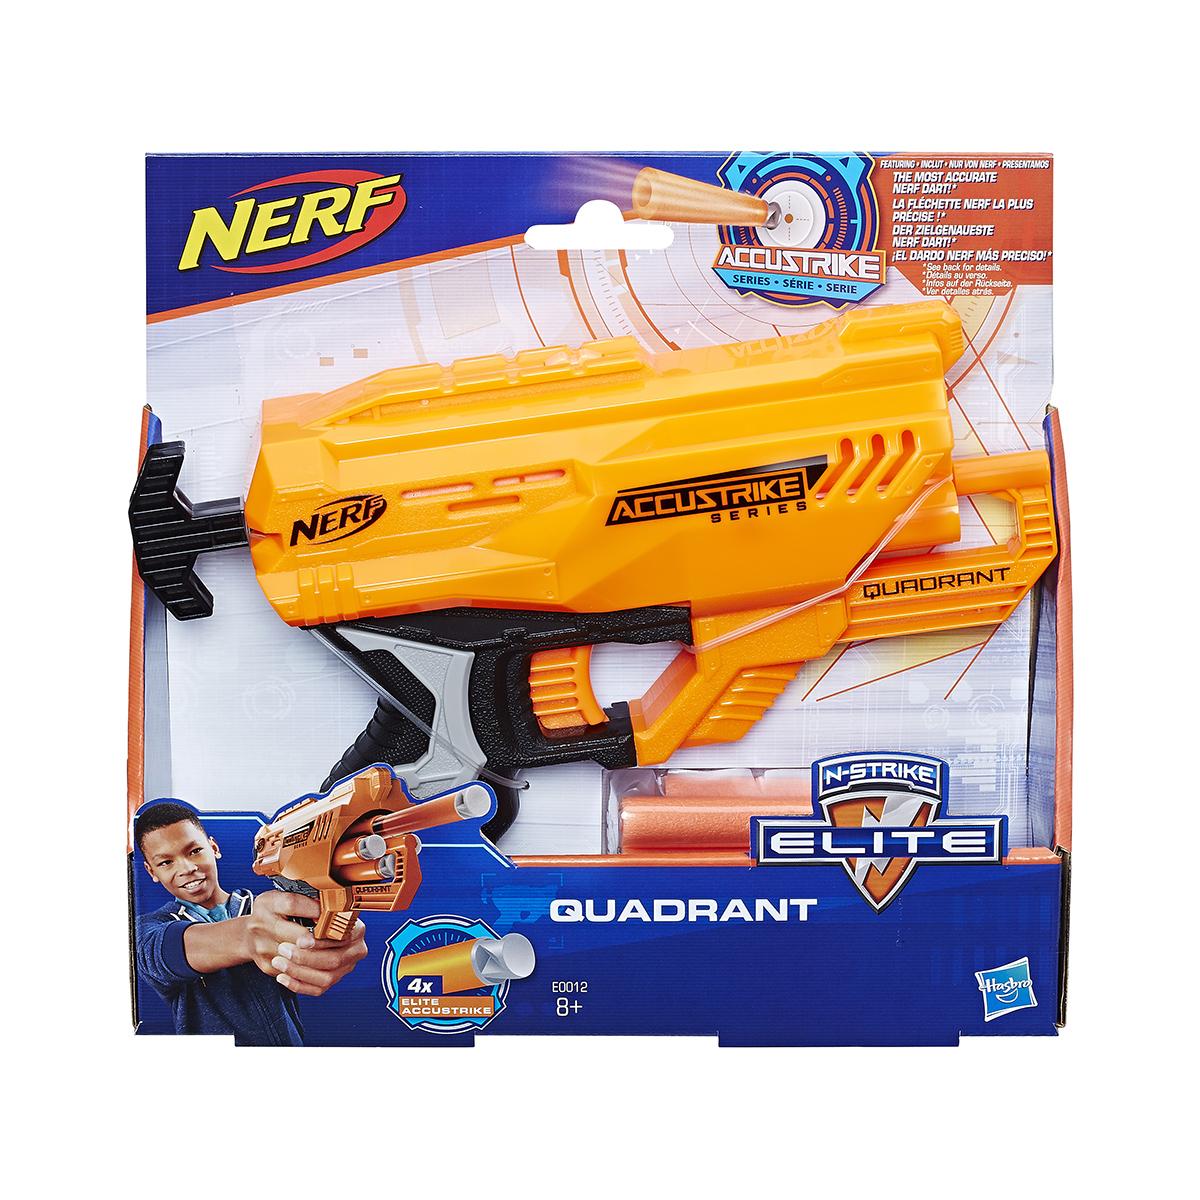 Blaster Nerf Accustrike Quadrant